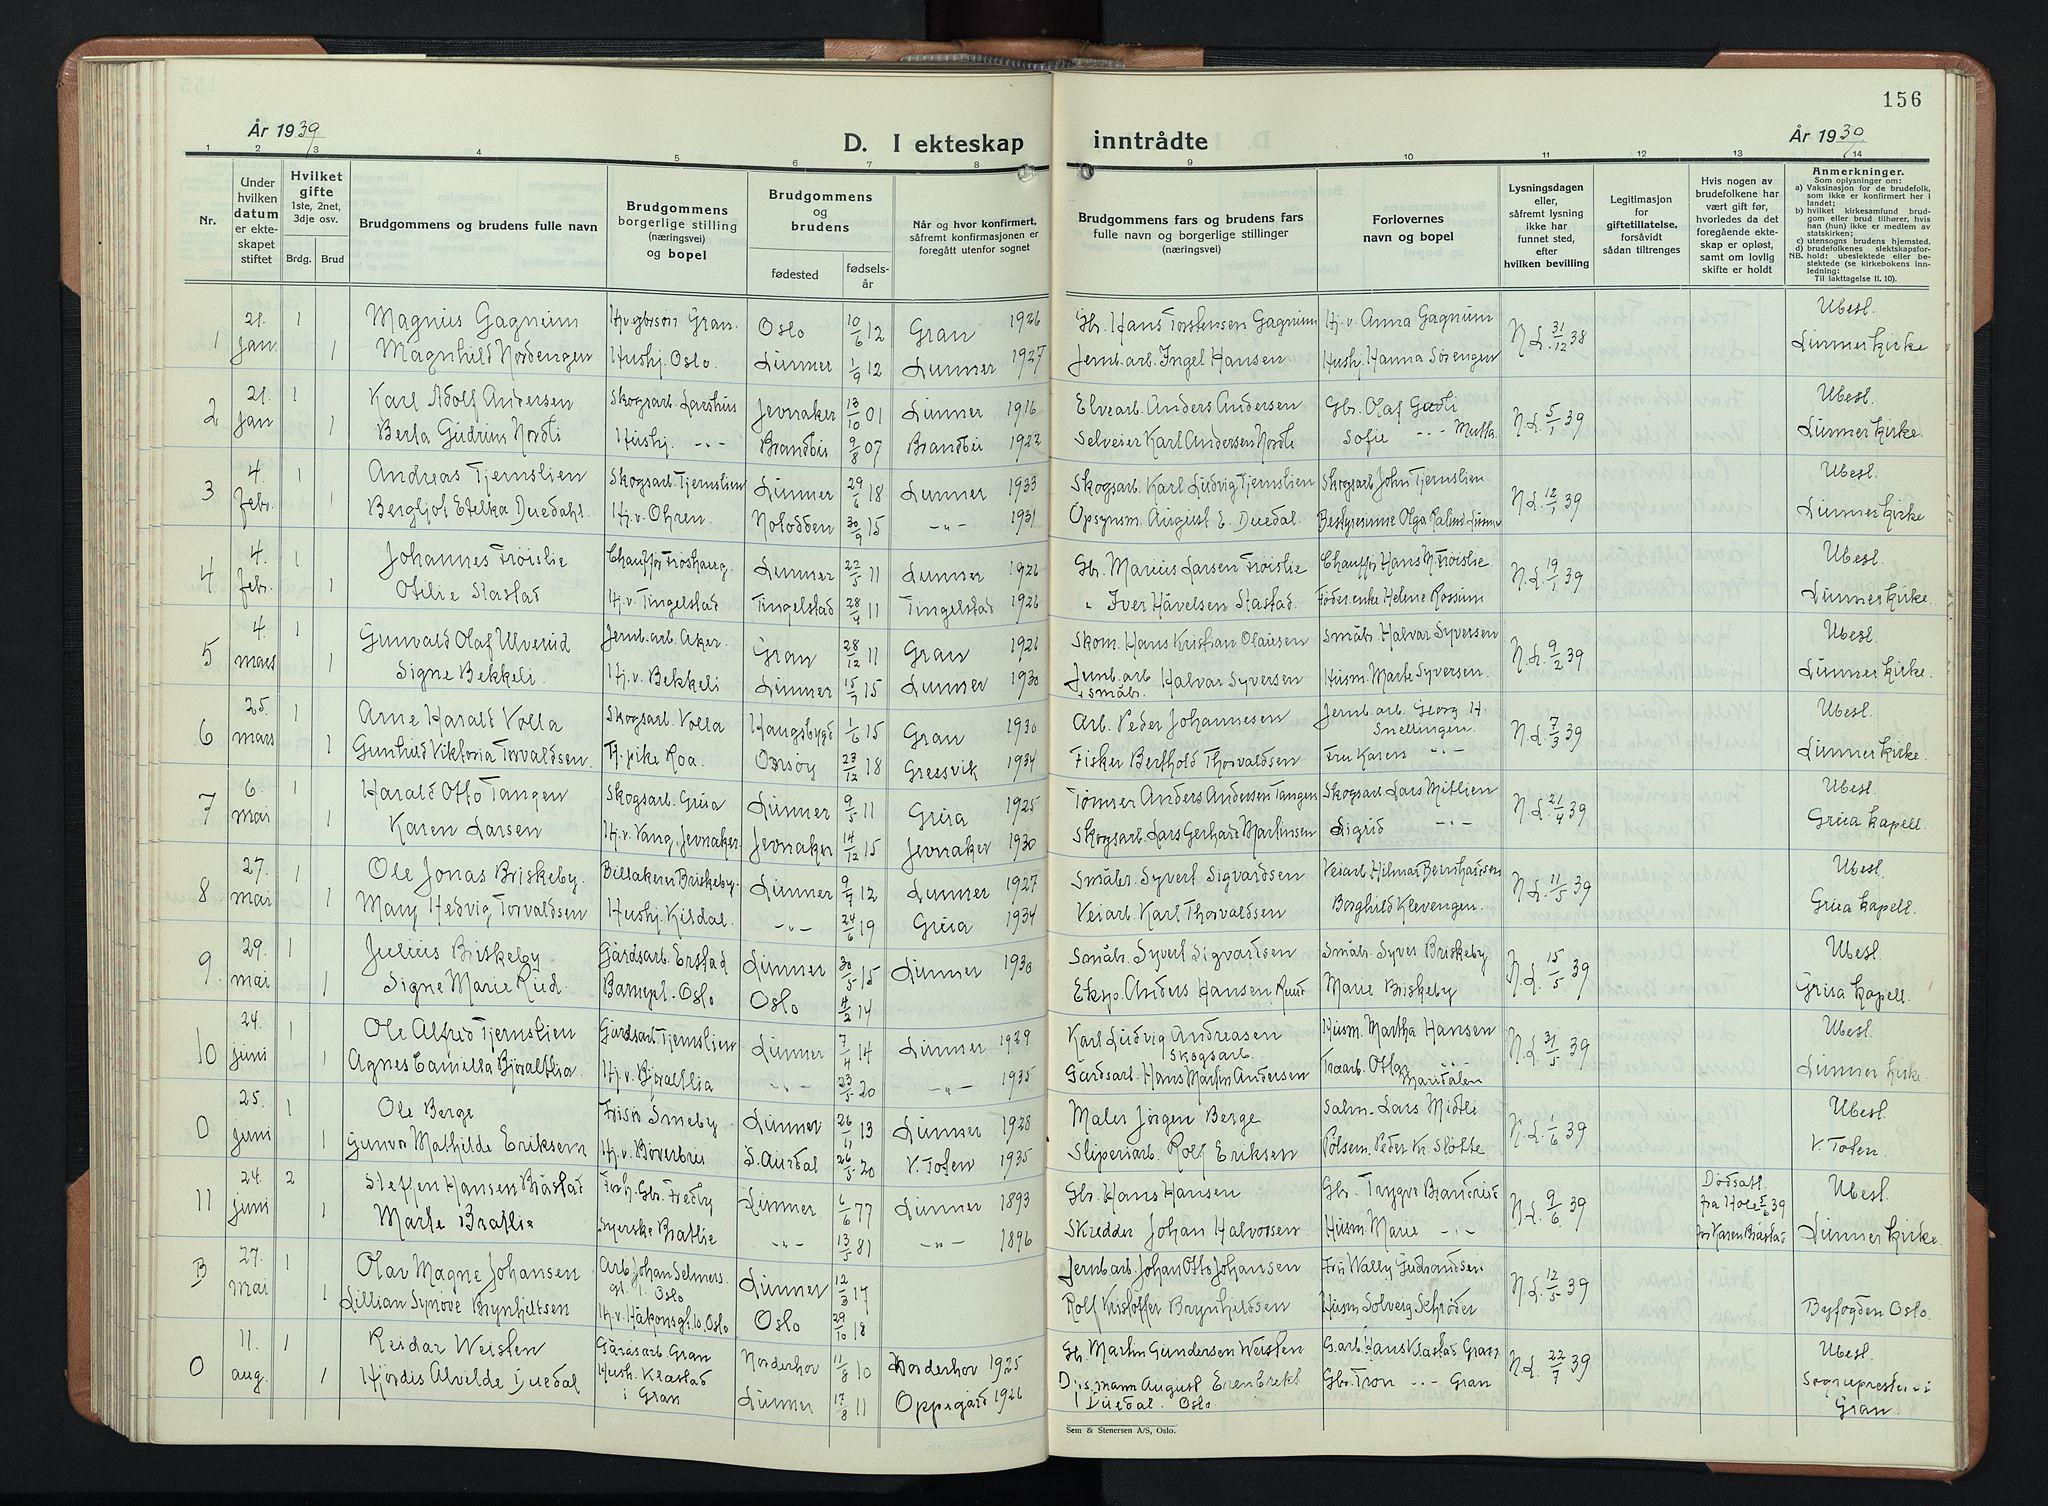 SAH, Lunner prestekontor, H/Ha/Hab/L0003: Klokkerbok nr. 3, 1933-1945, s. 156